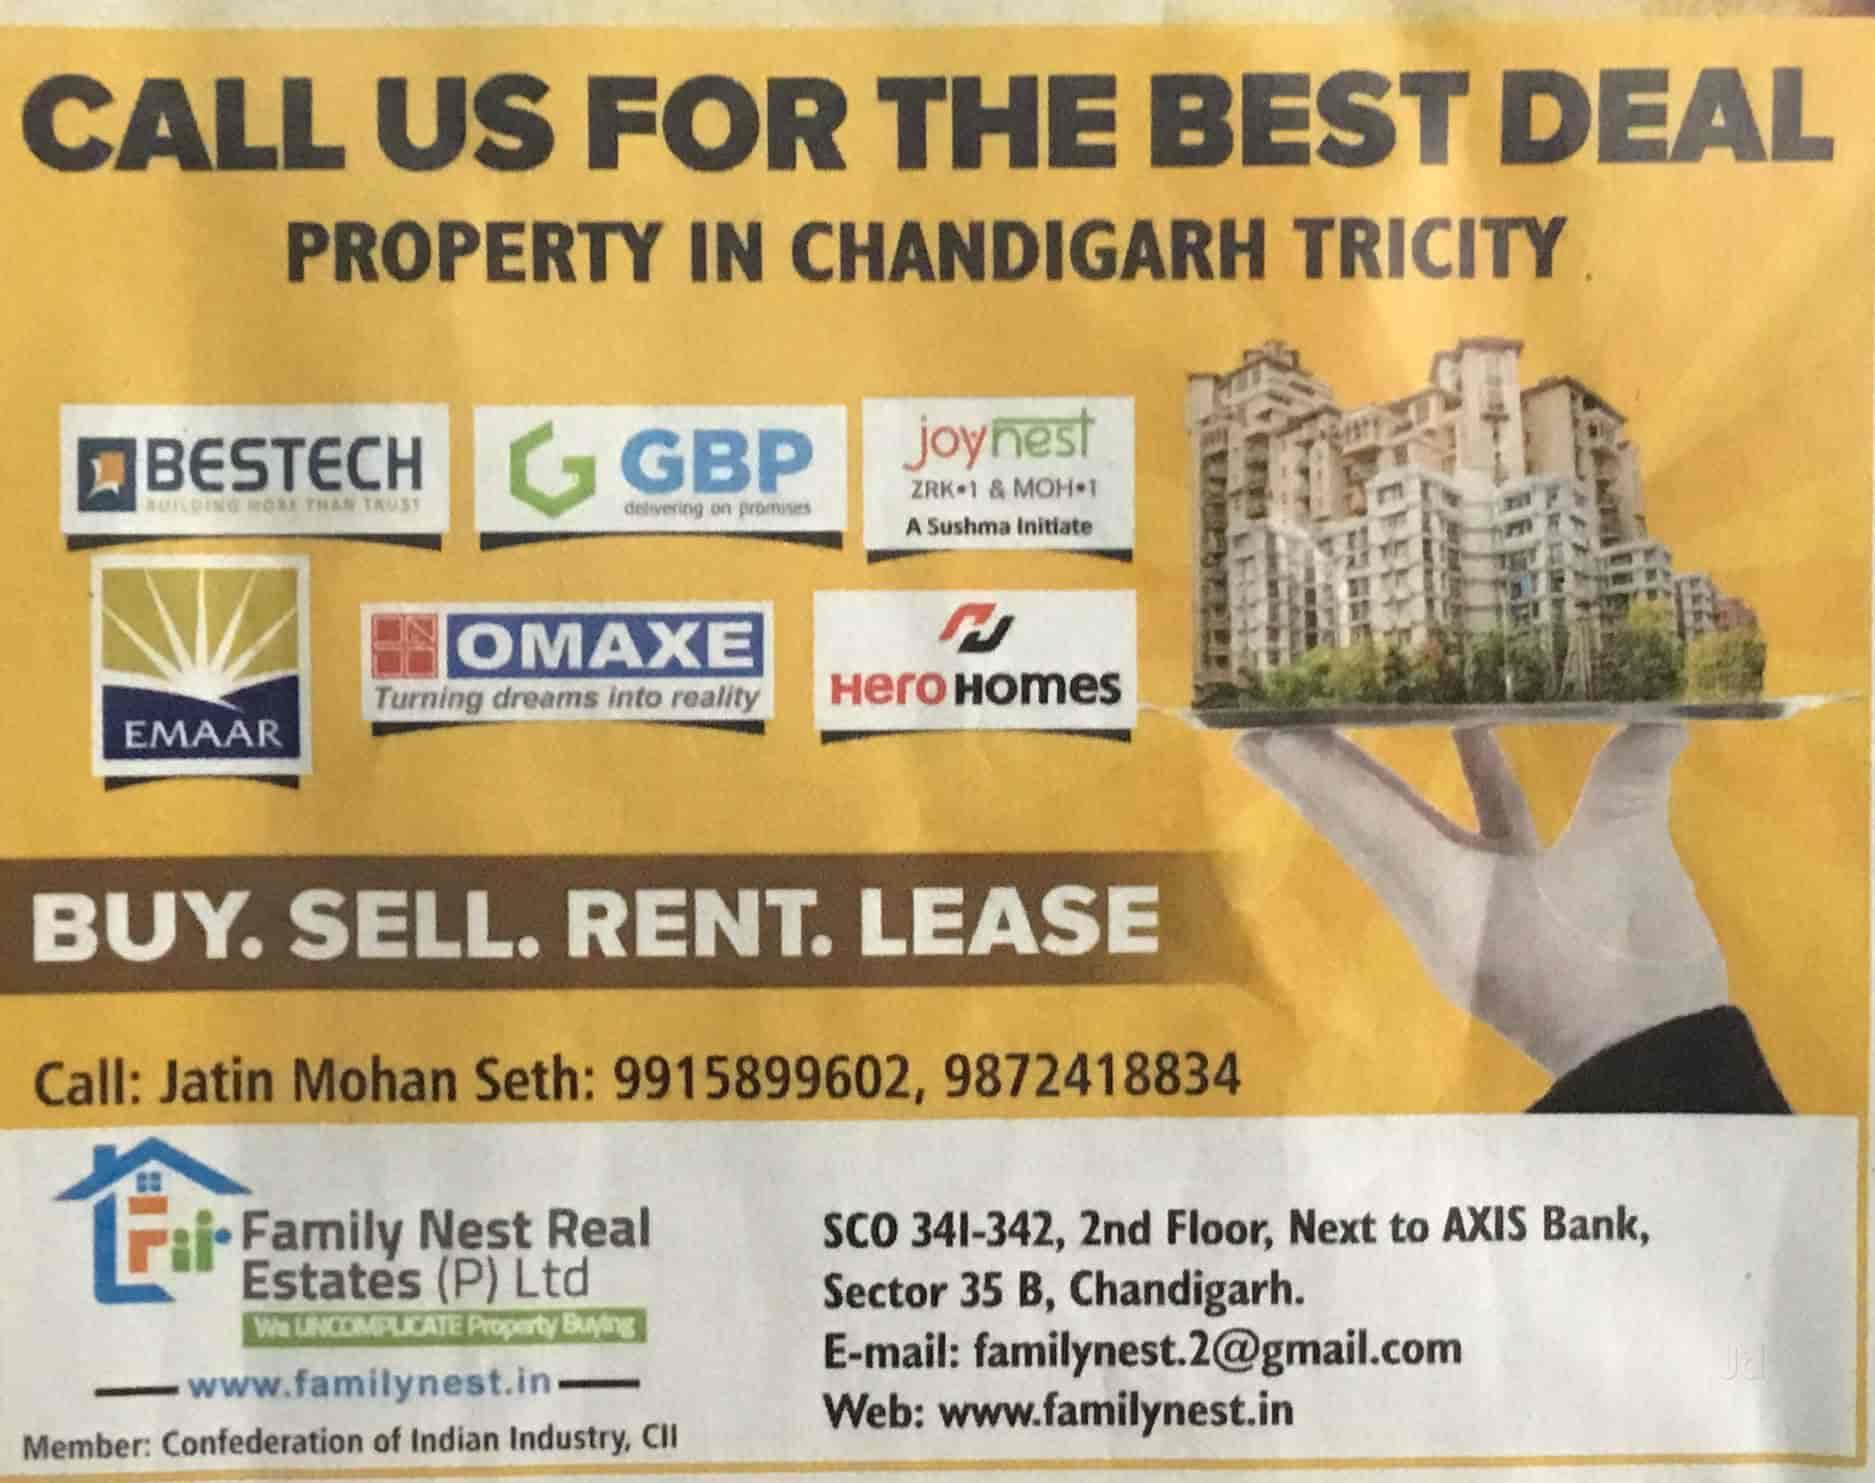 Family Nest Real Estates Pvt Ltd, Sector 35b - Estate Agents